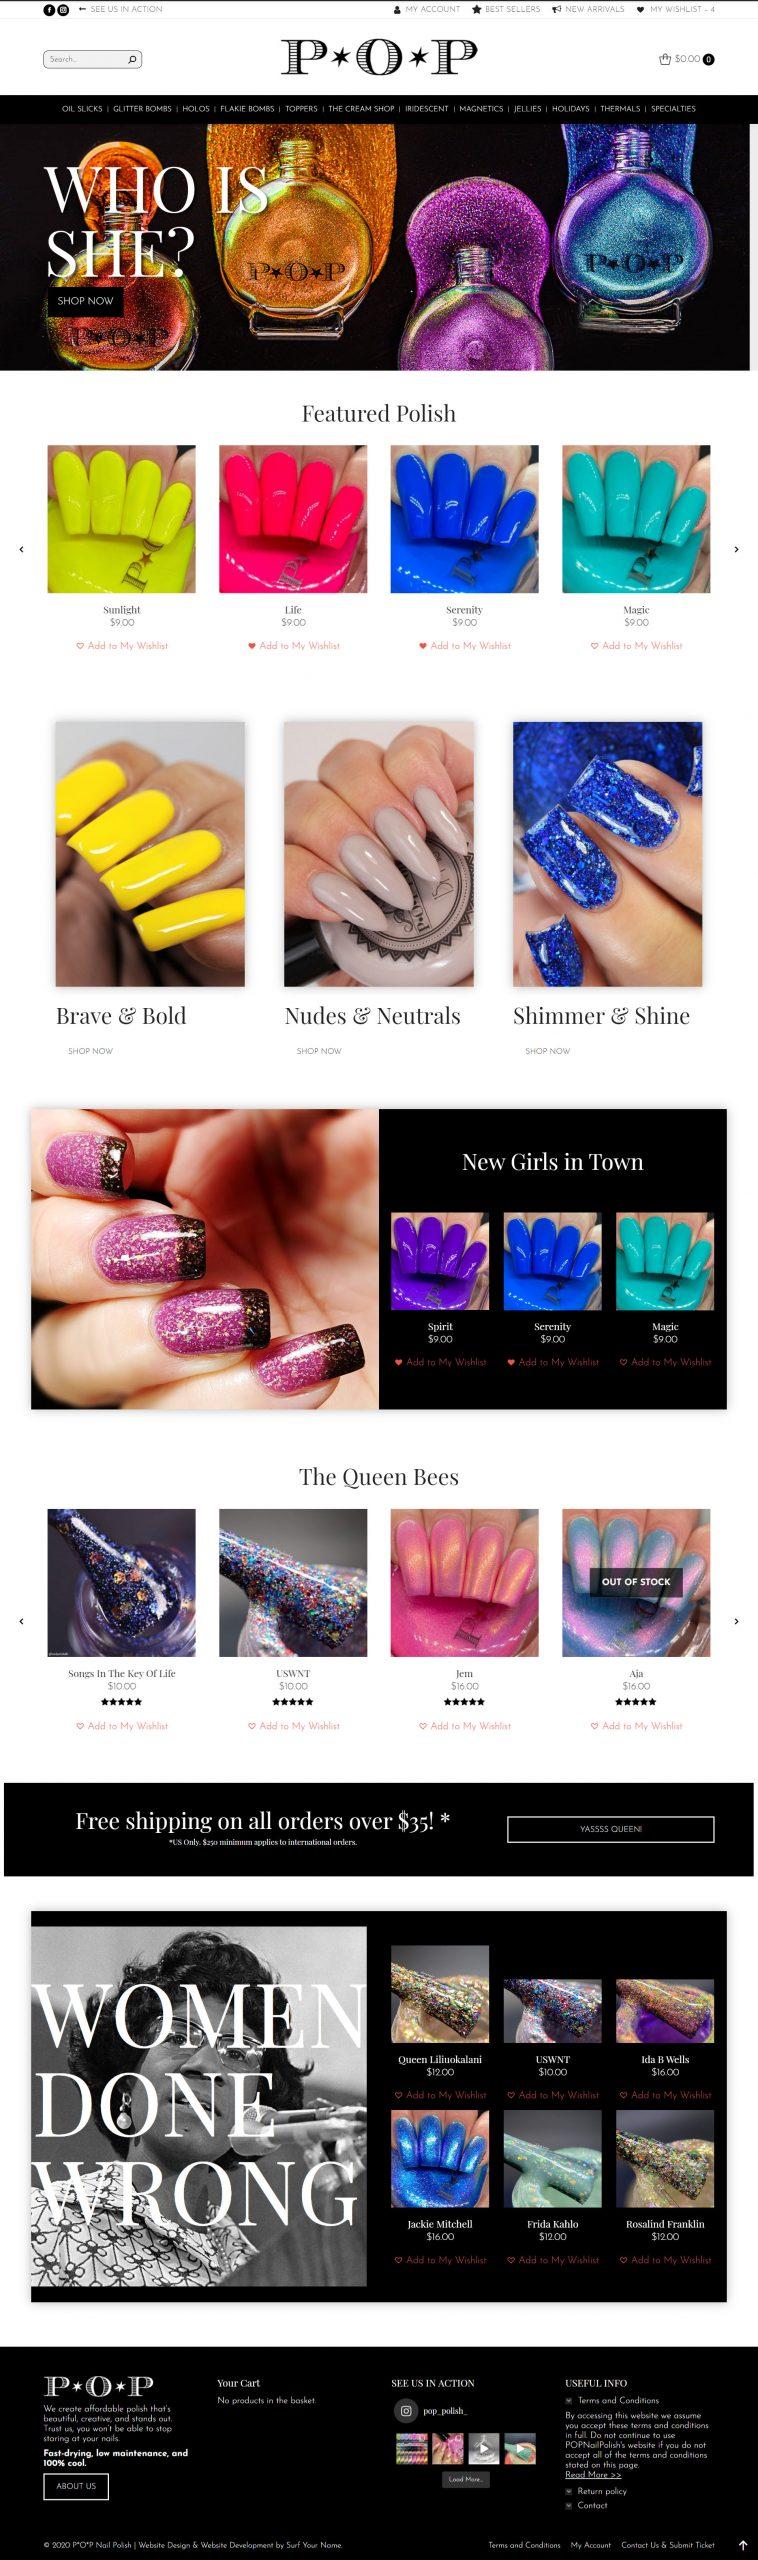 Shop POP - Web Design Packages - Norfolk Web Design - Virginia Beach Web Design